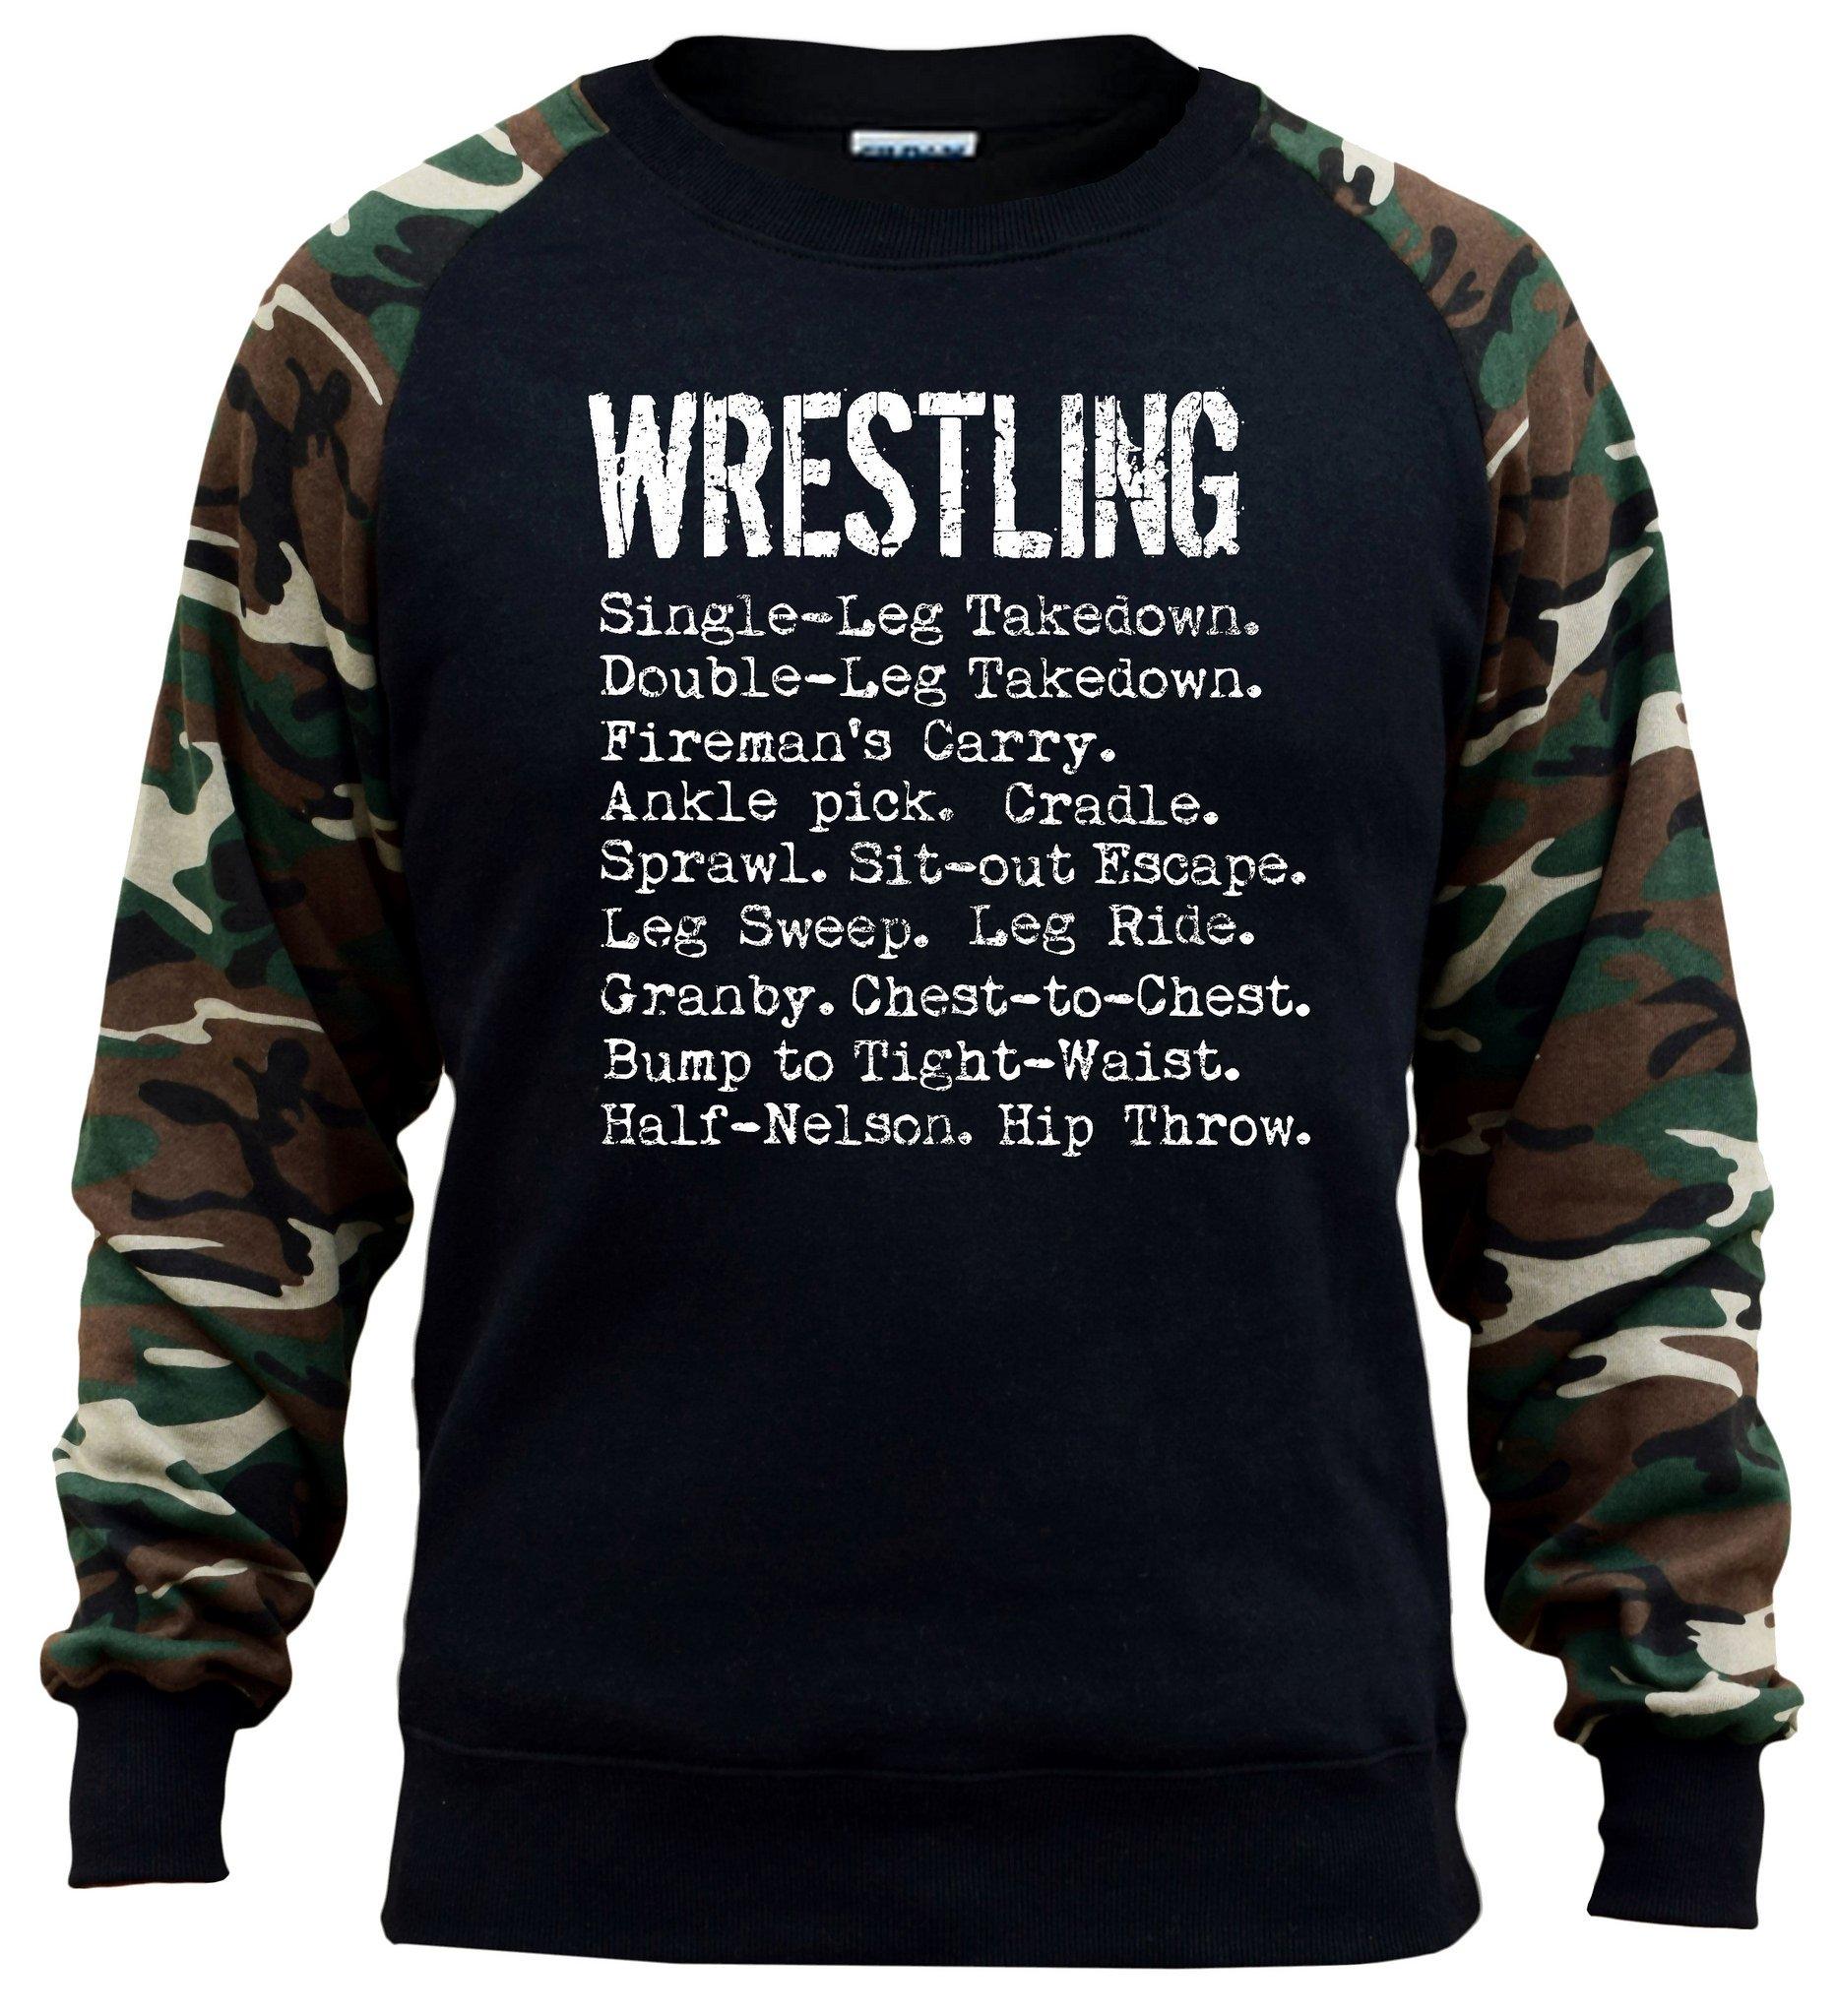 Men's Wrestling Moves Black/Camo Raglan Baseball Sweatshirt Large Black by Interstate Apparel